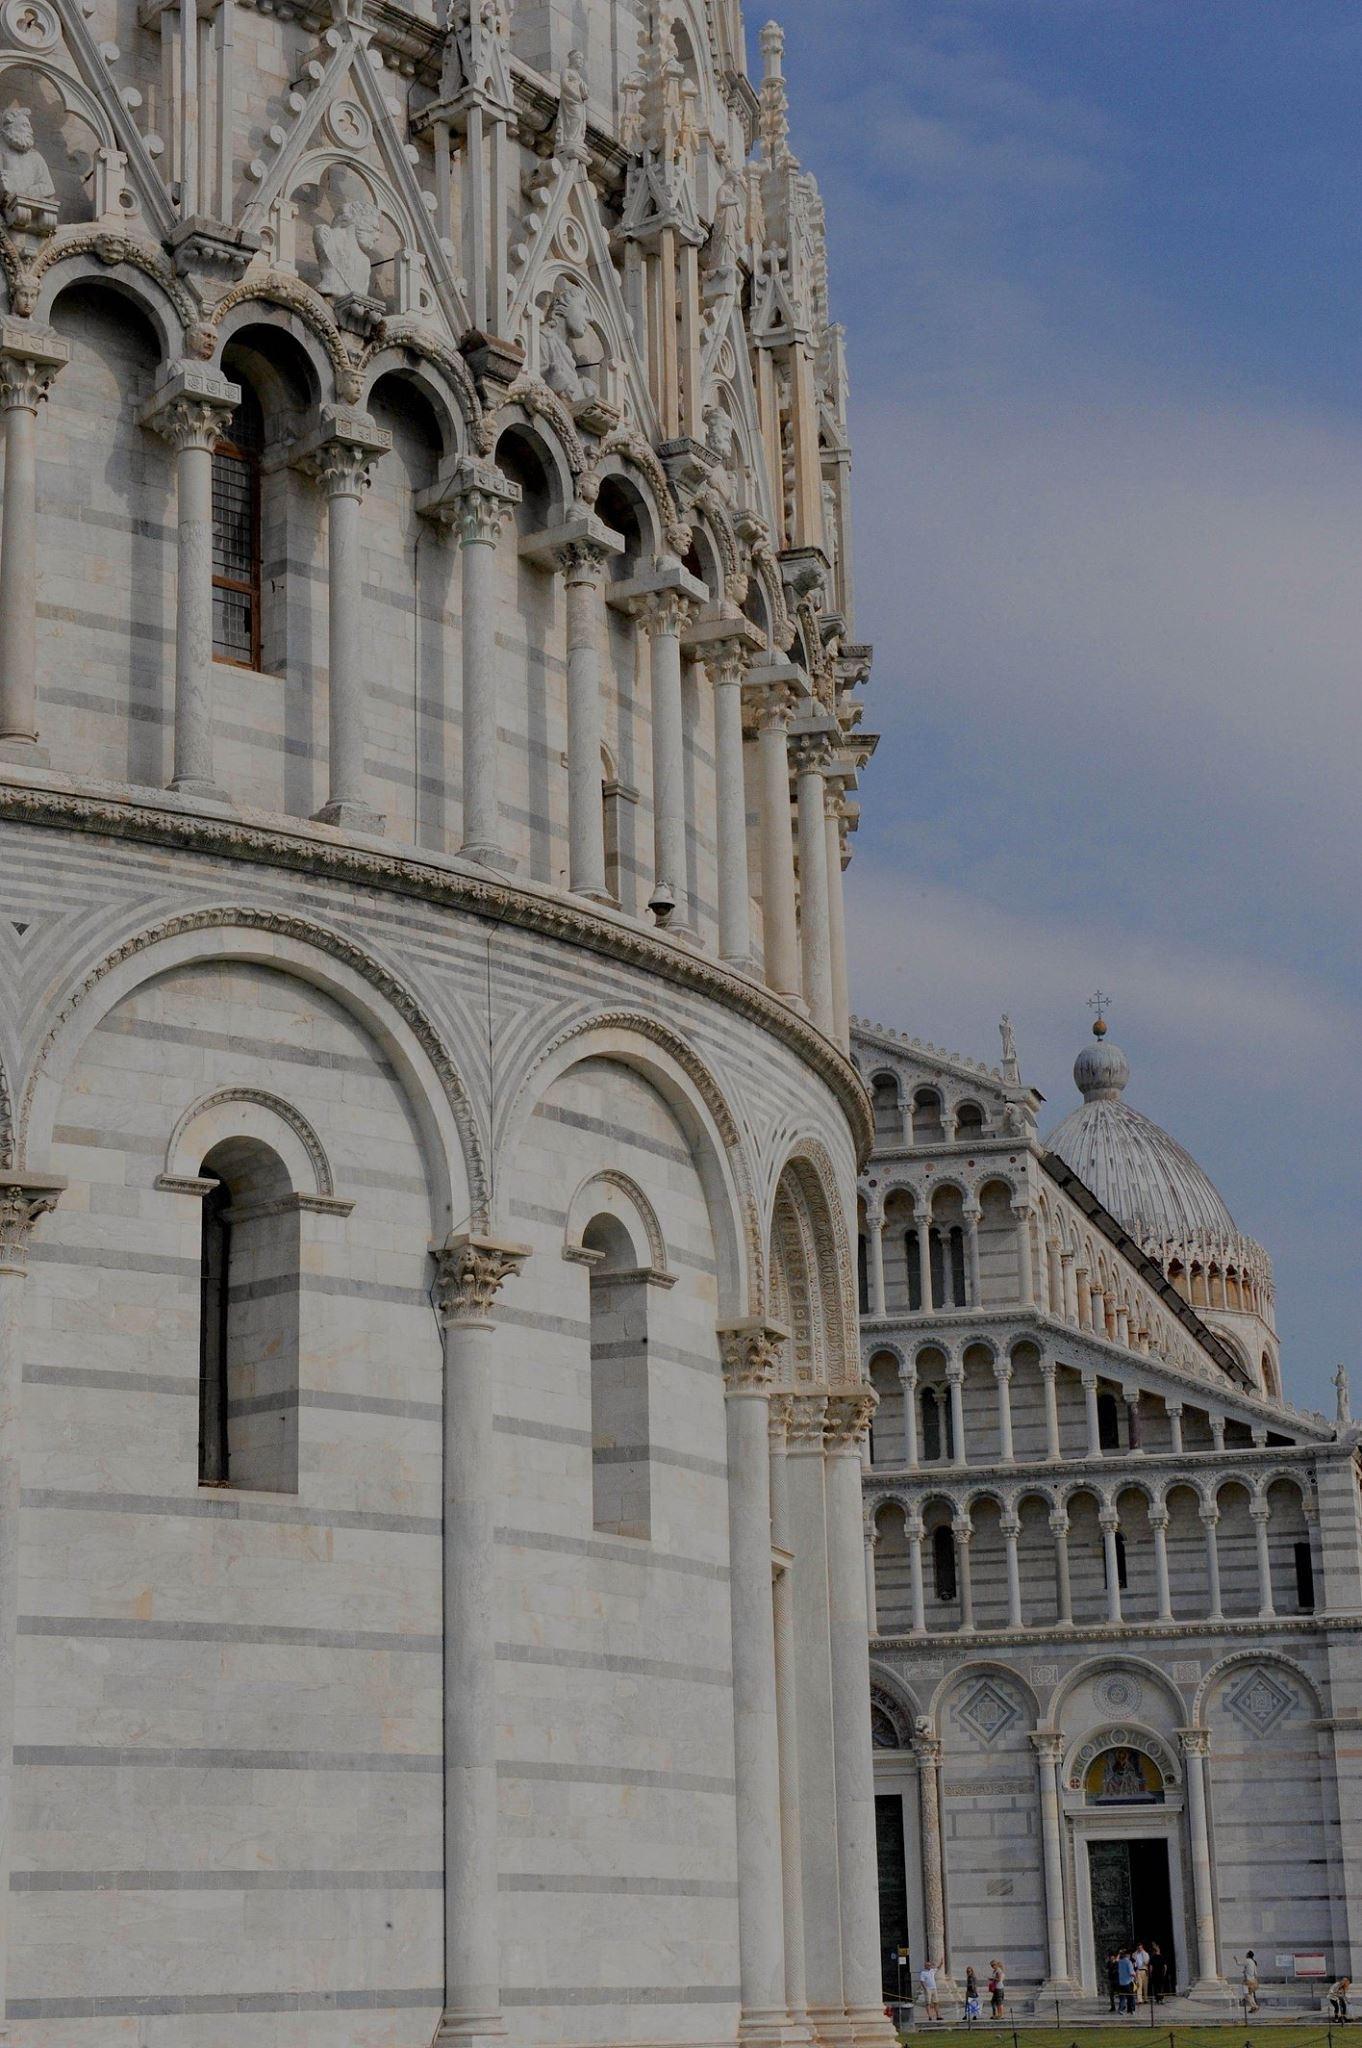 Bella Italia - Pisa 2018 by Robert Malin Young